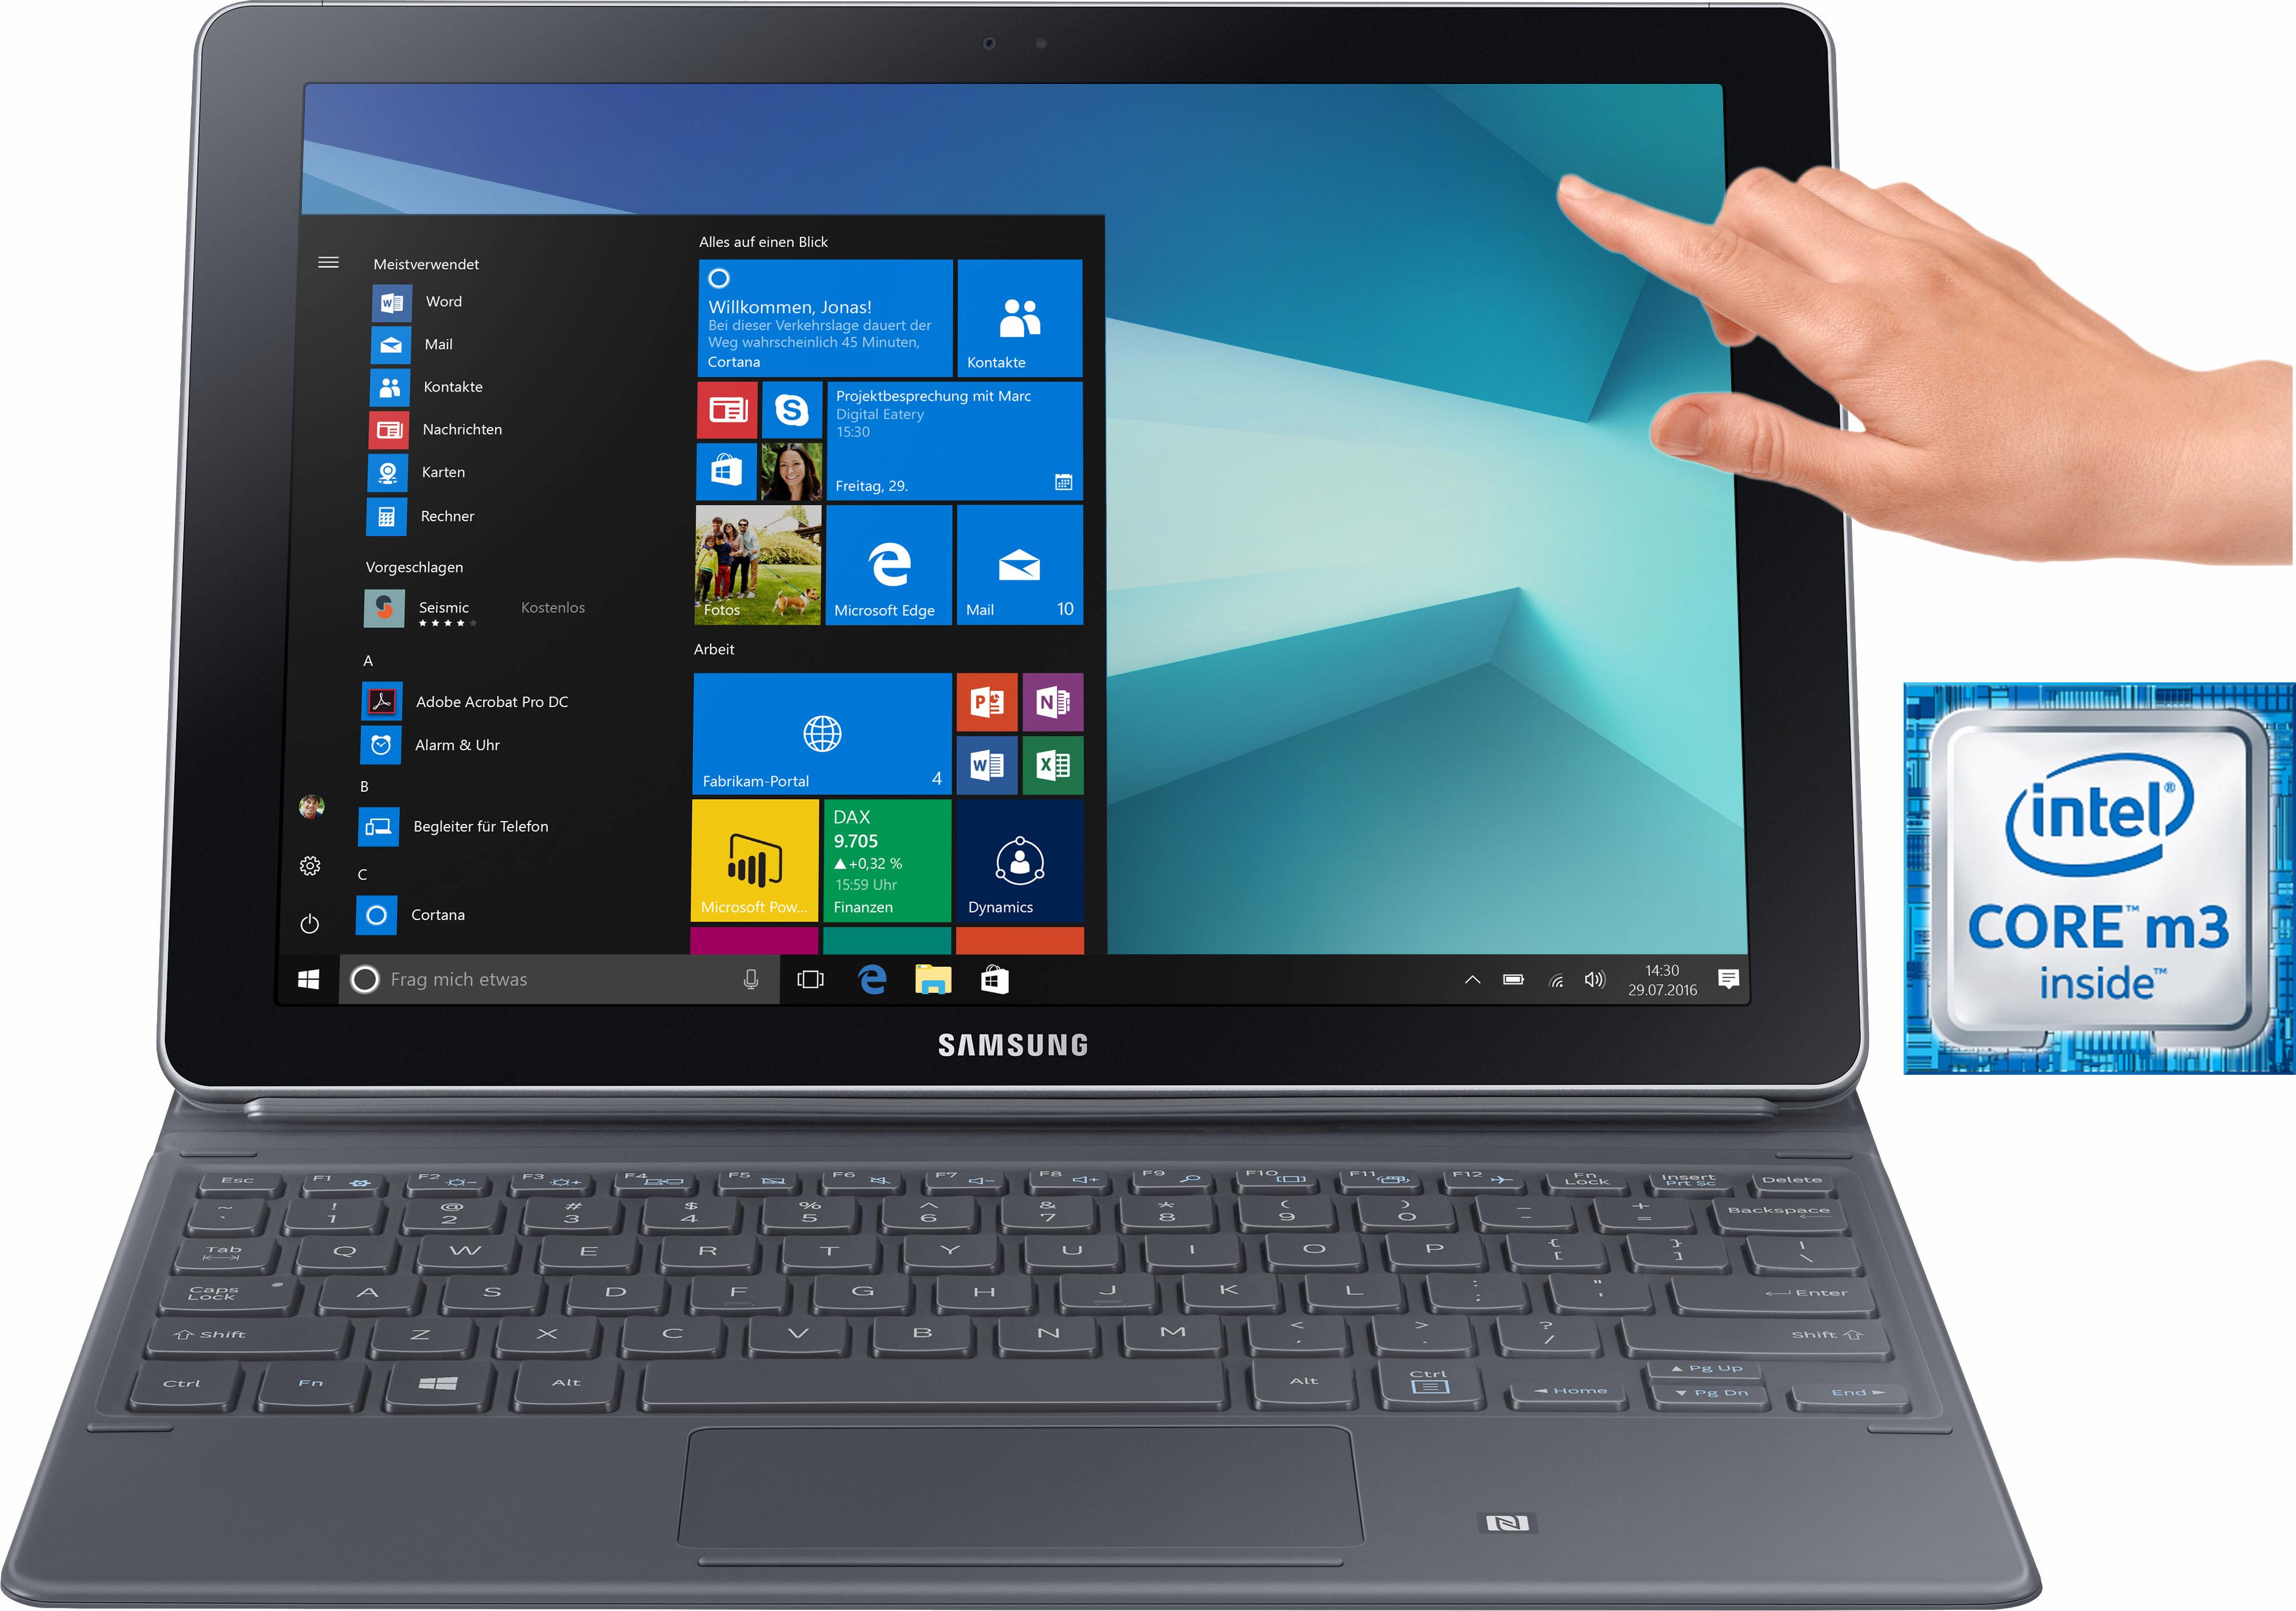 Samsung Galaxy Book 10.6 WiFi Convertible Notebook (10,6 Zoll, Intel, Core m3)